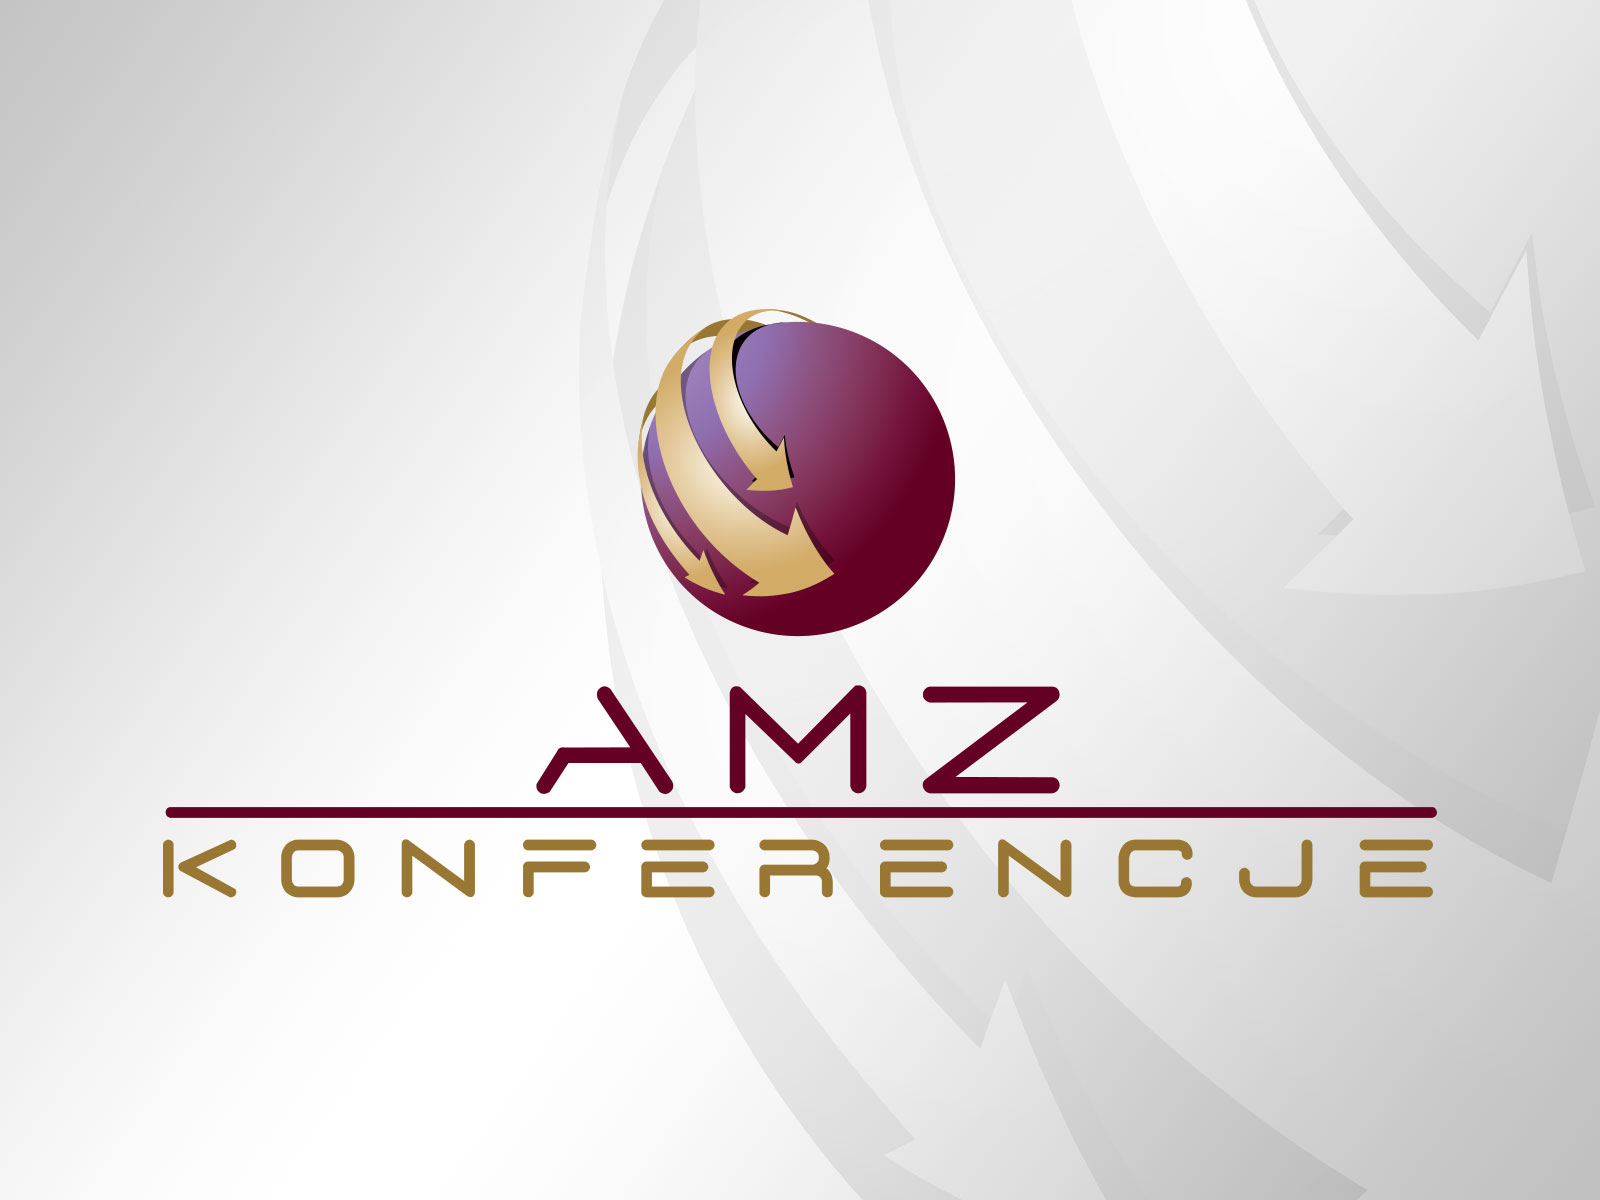 Logo AMZ Konferencje